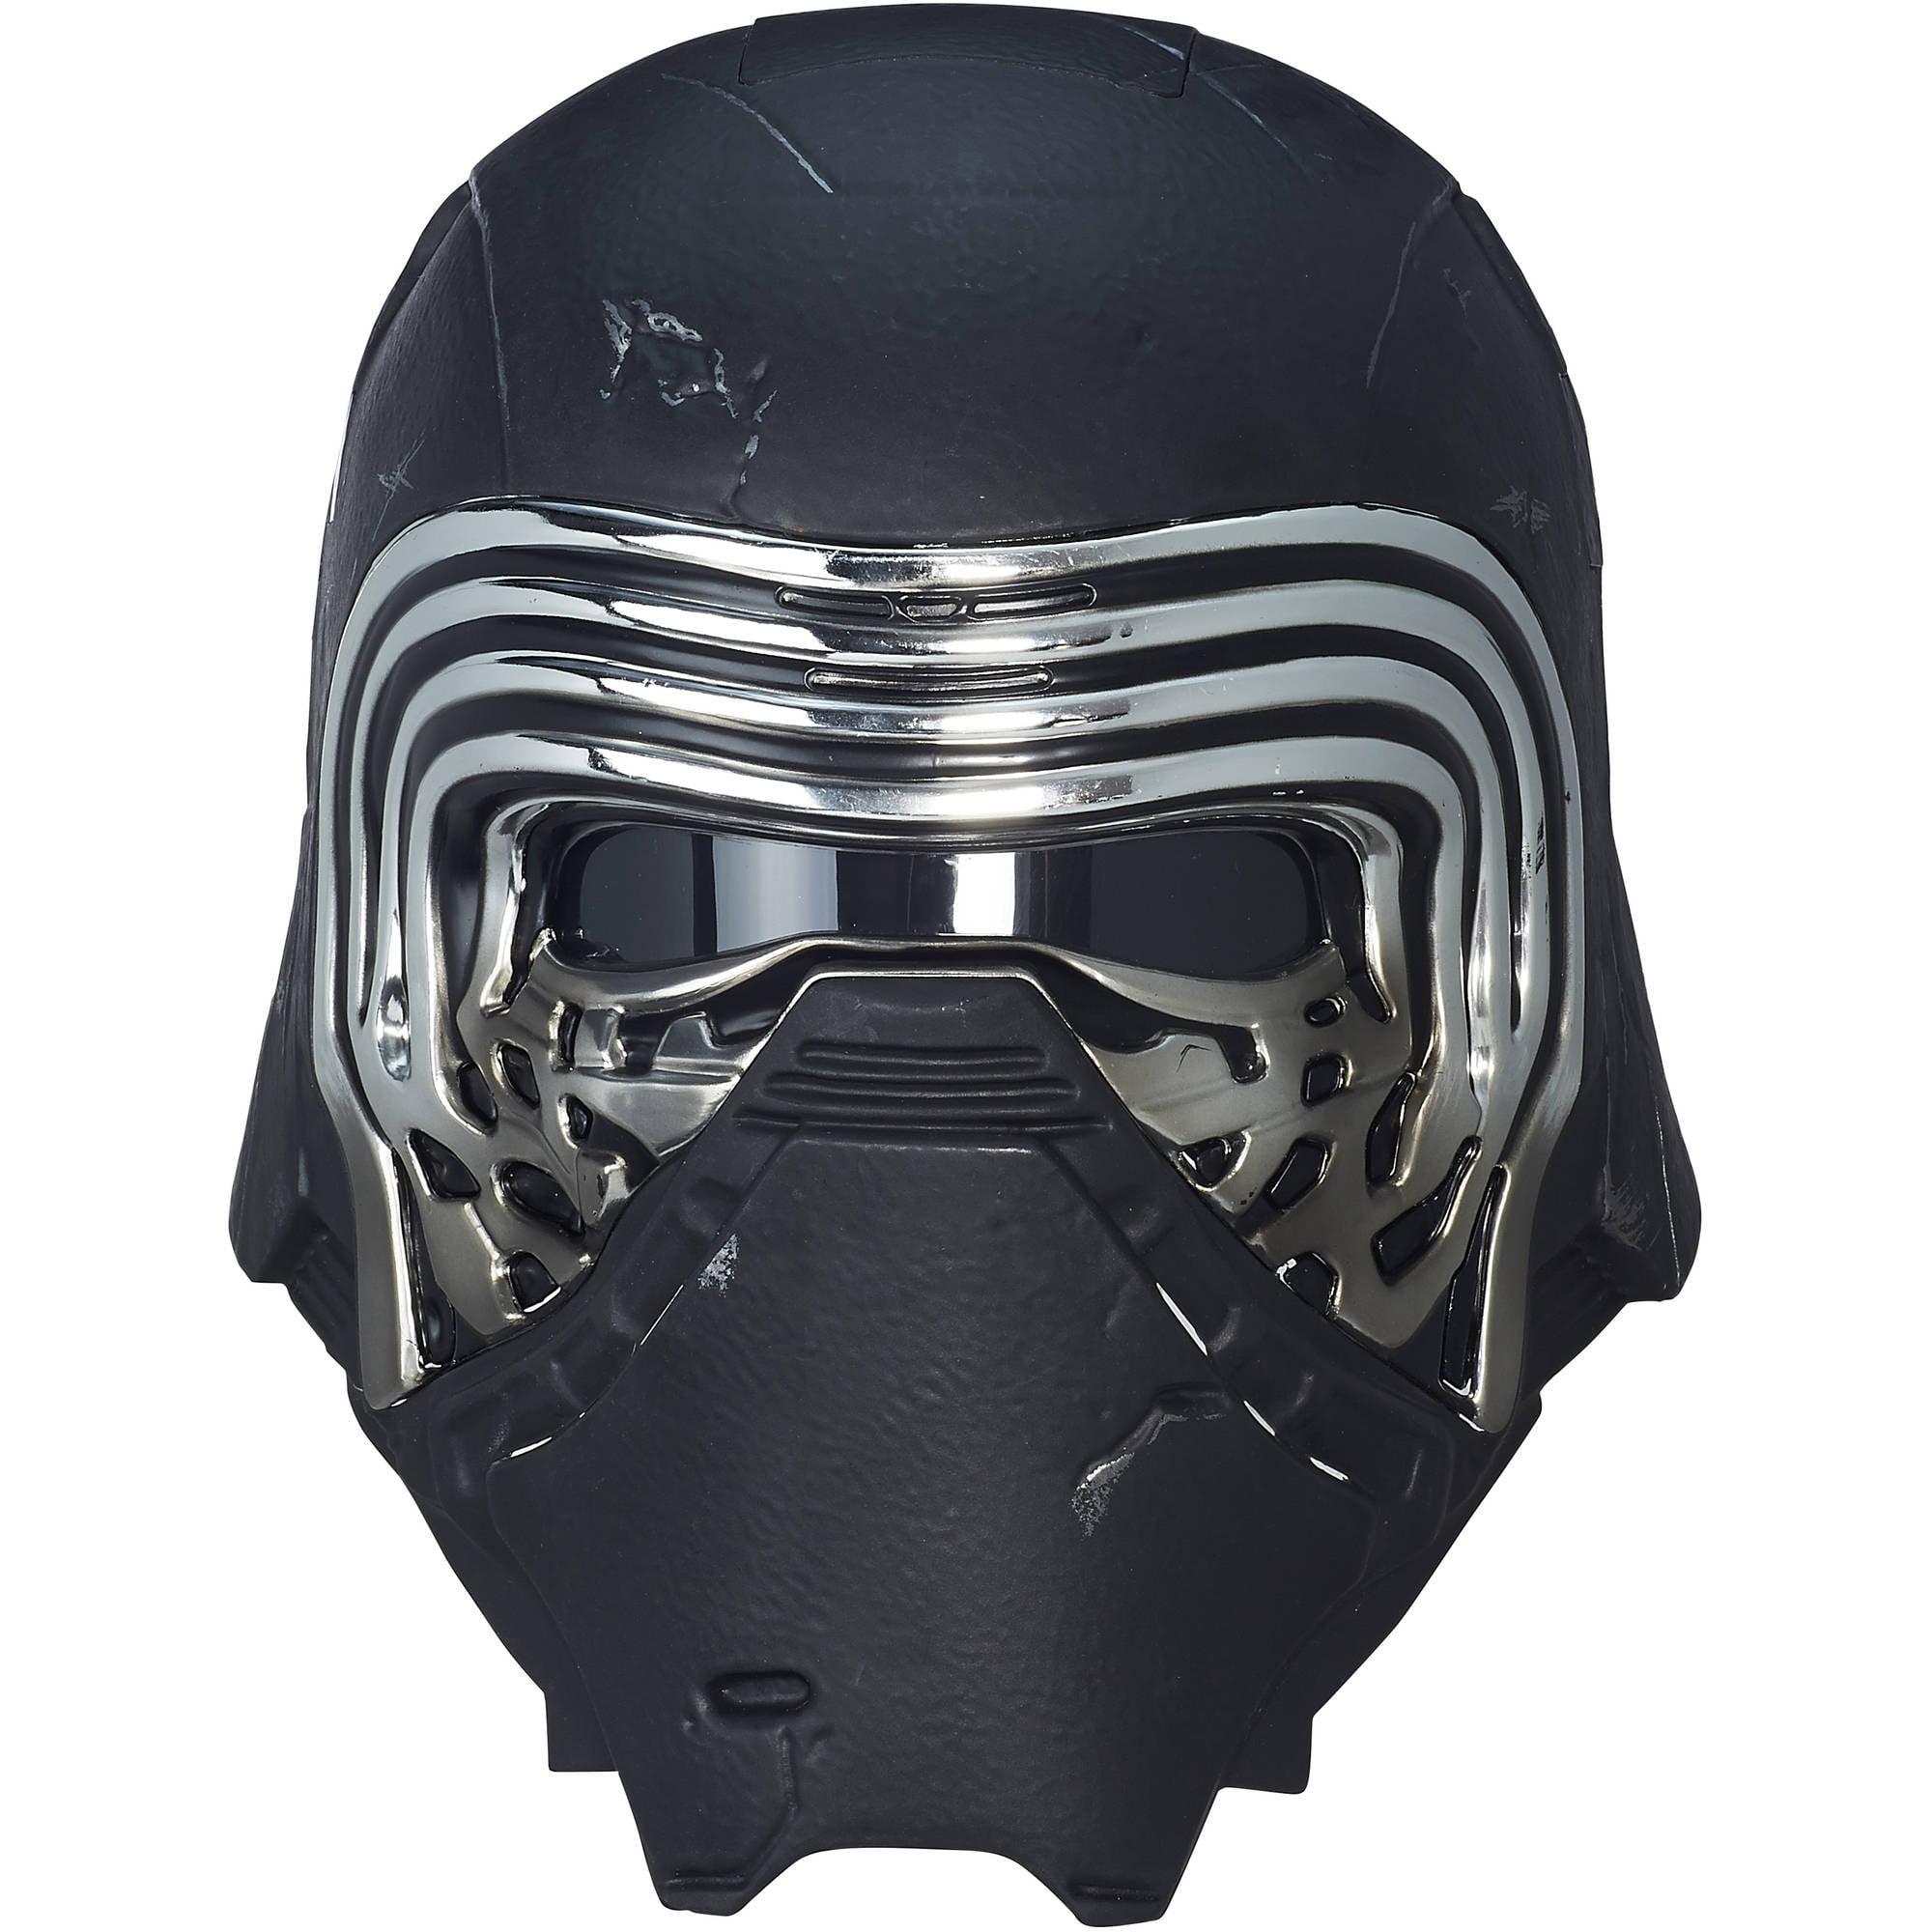 Star Wars The Black Series Kylo Ren Voice Changer Helmet by Hasbro